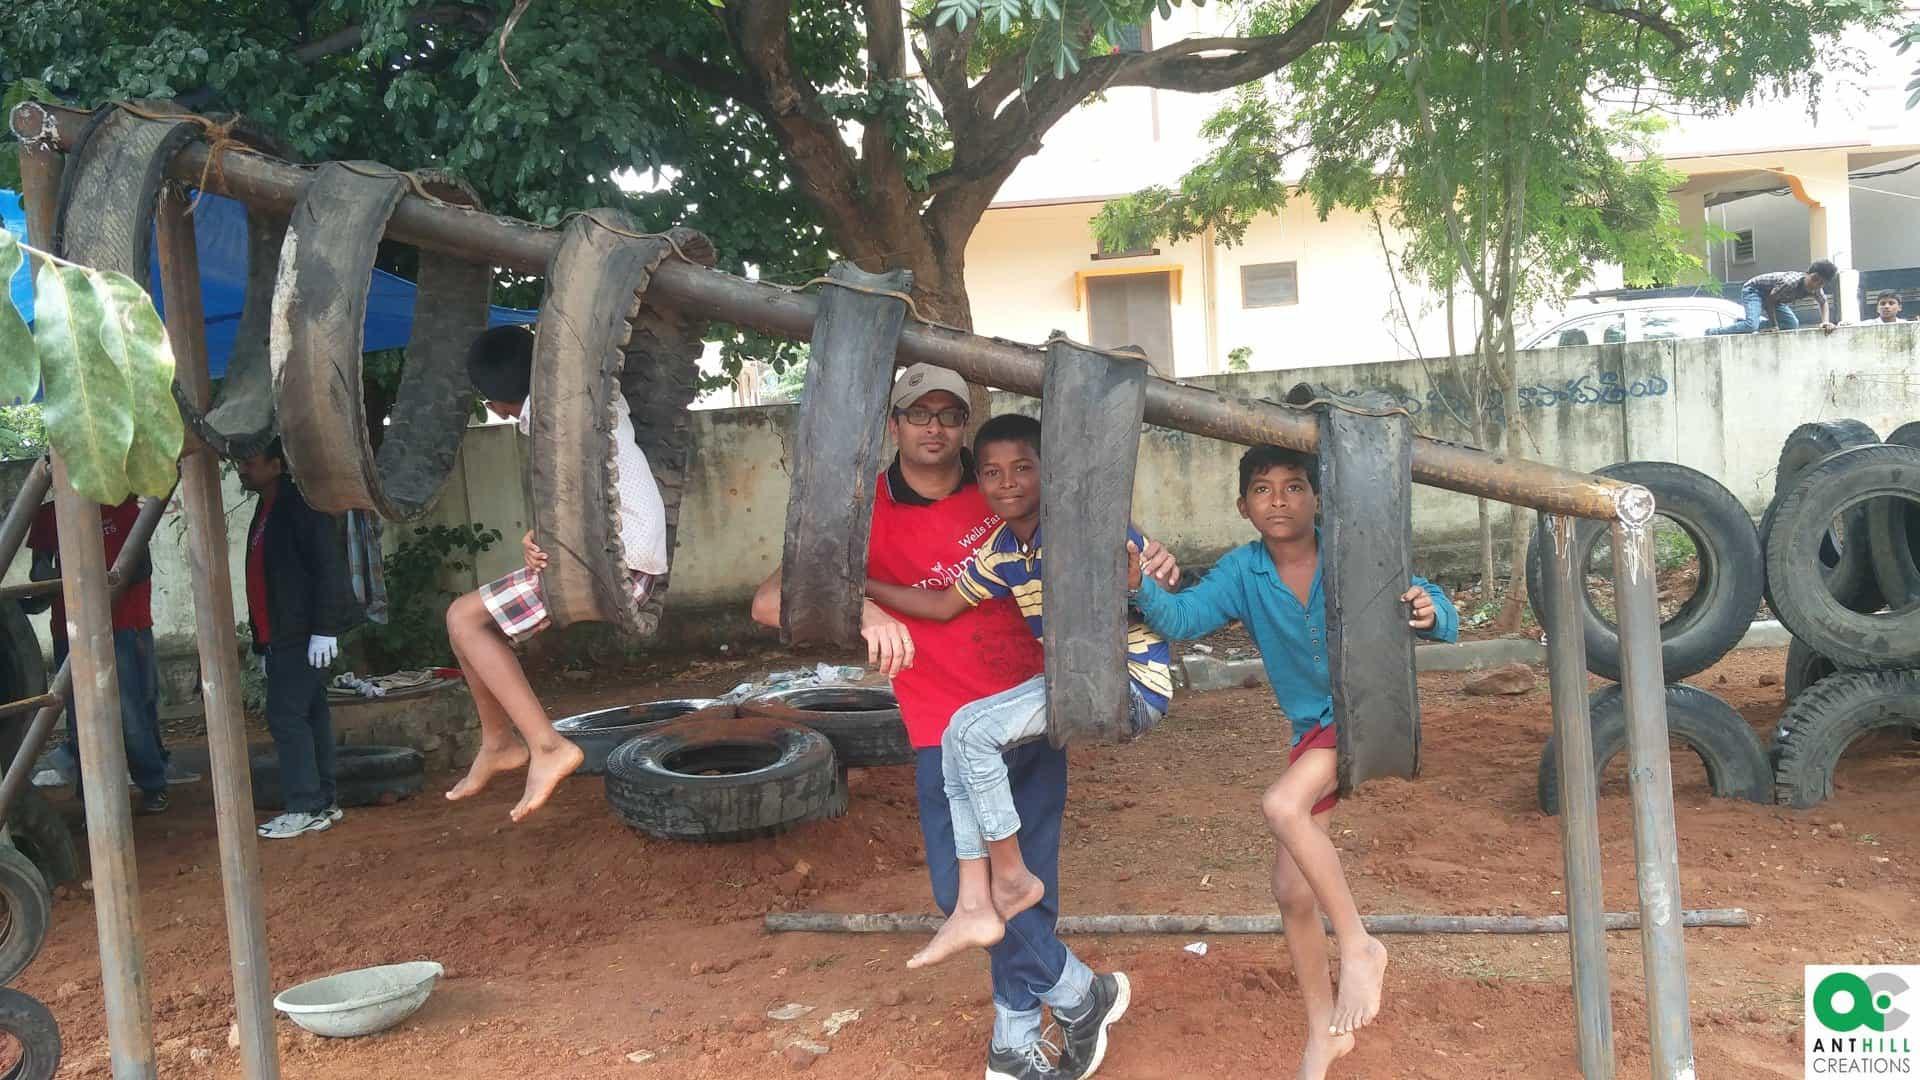 india playgrounds